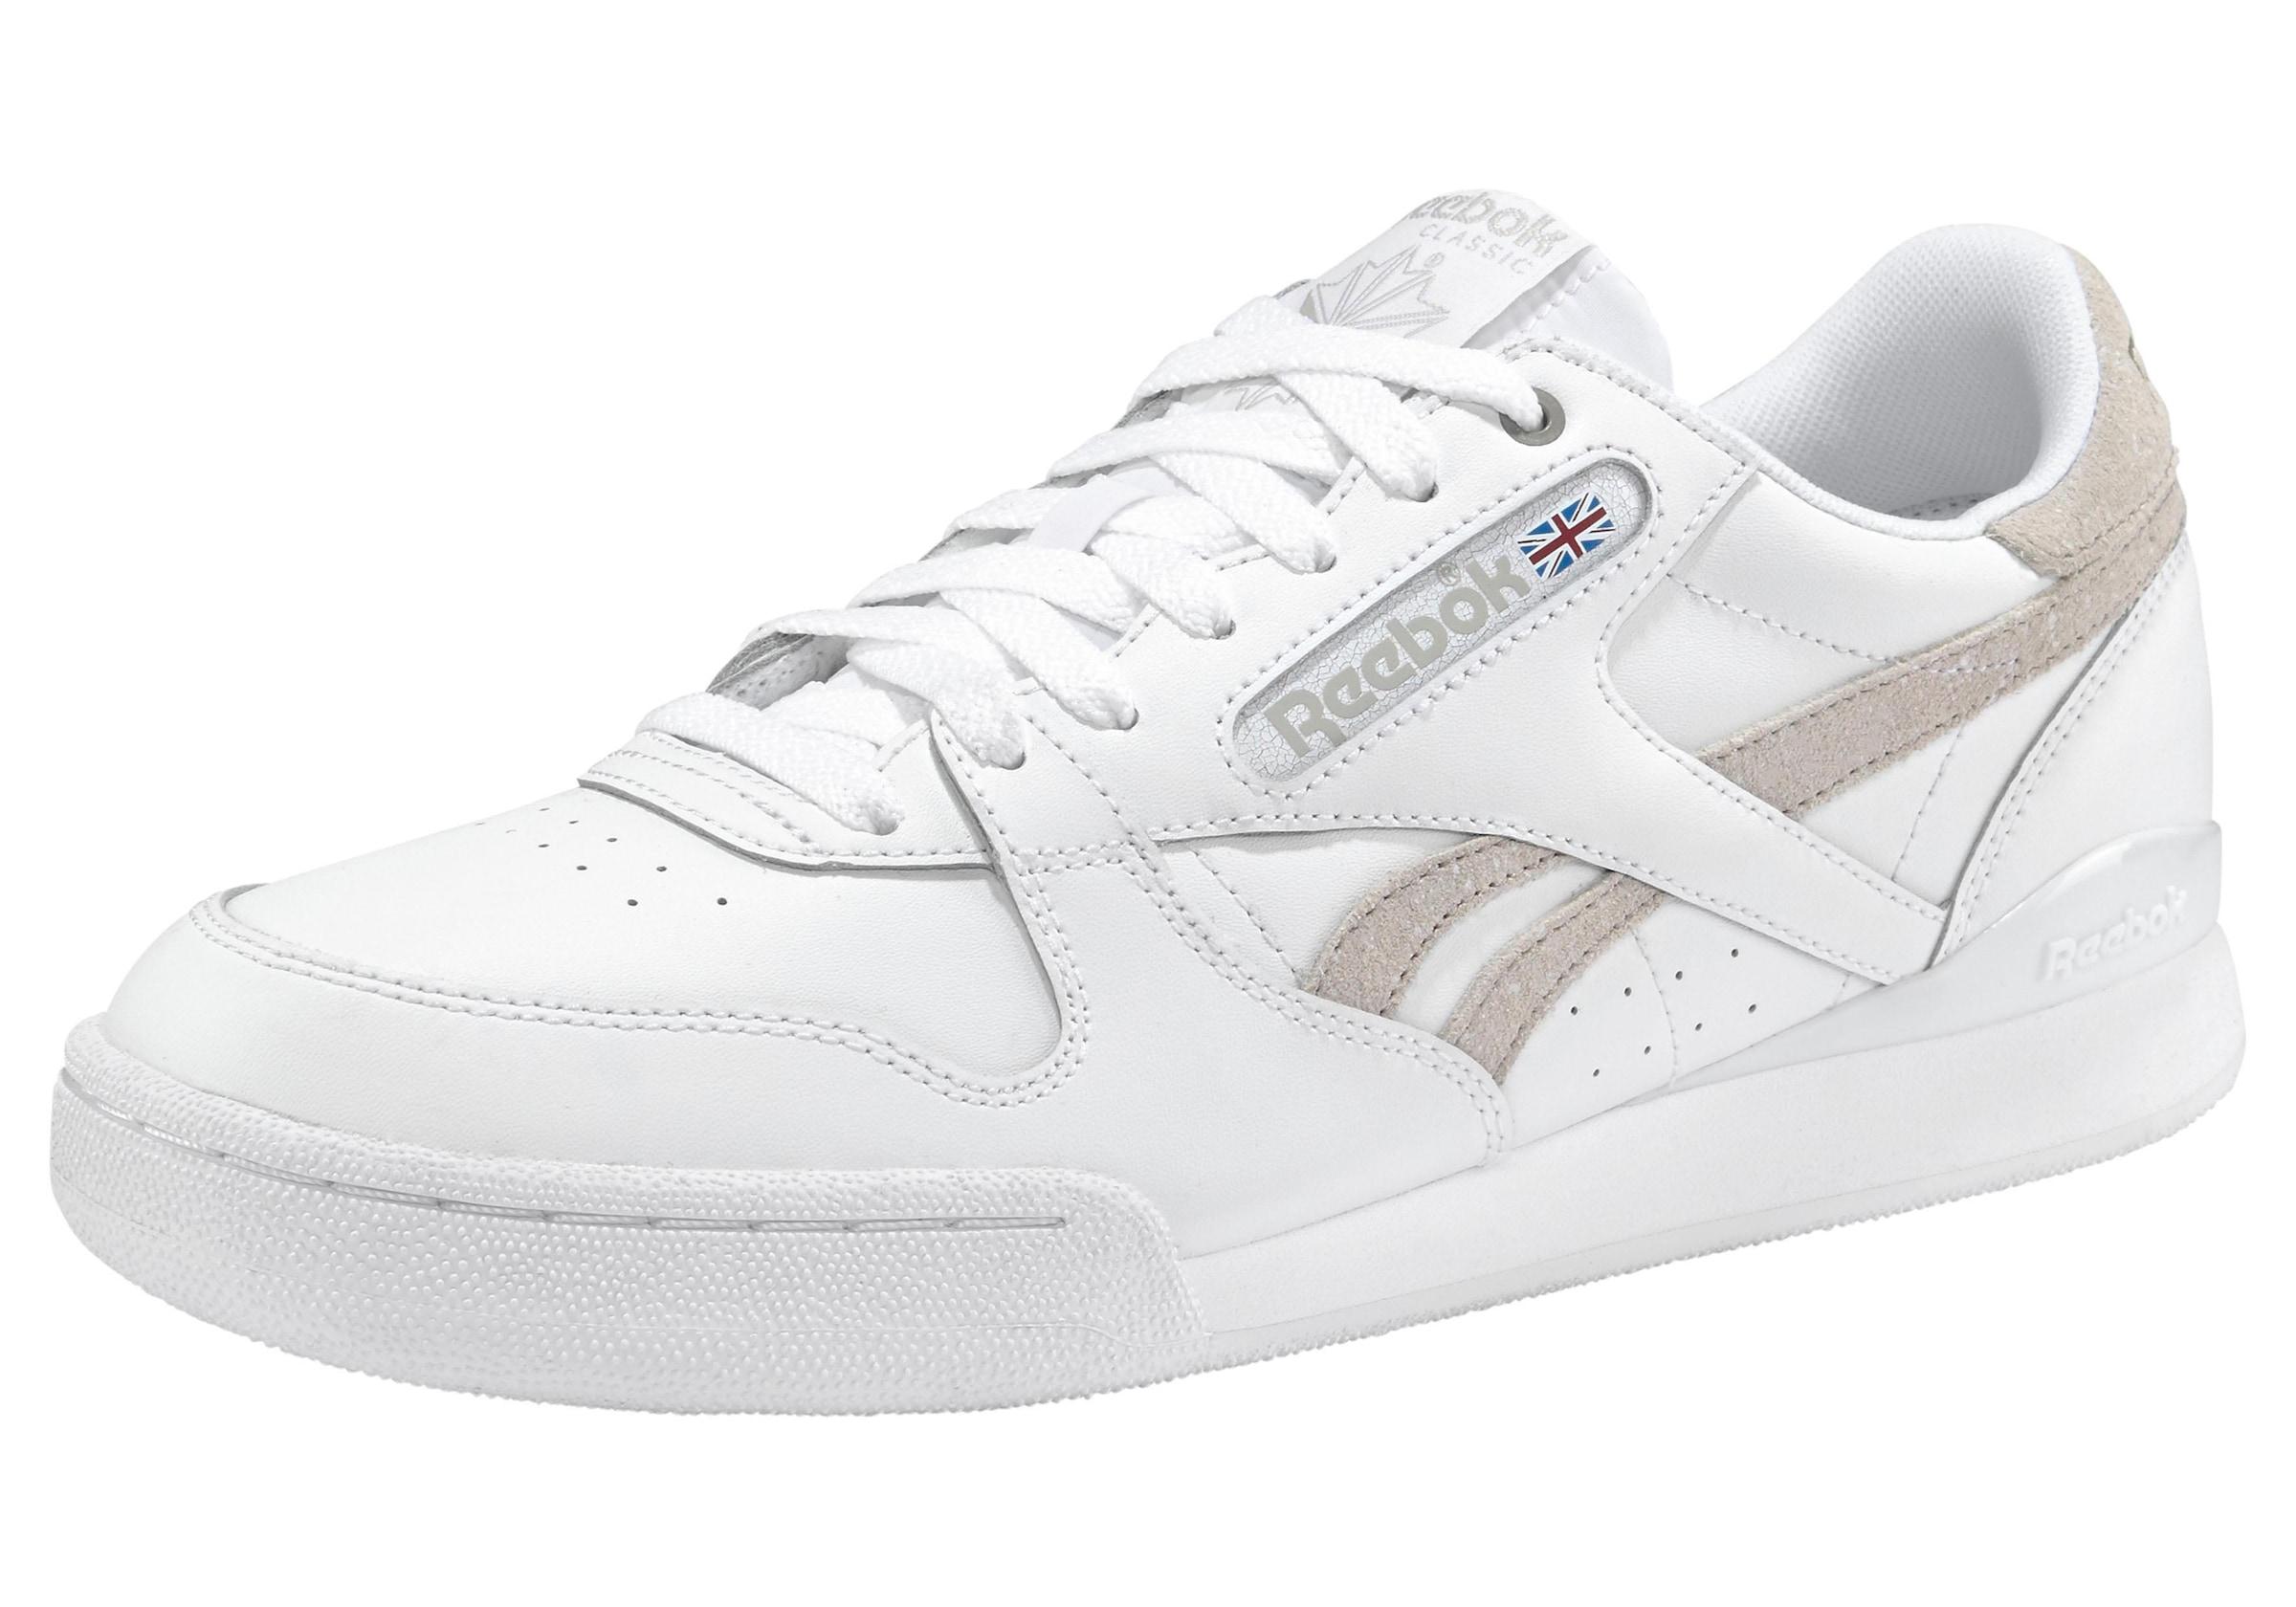 Reebok Classic Sneaker Wmns Phase 1 Pro Pro Pro MU per Rechnung | Gutes Preis-Leistungs-Verhältnis, es lohnt sich e5e865